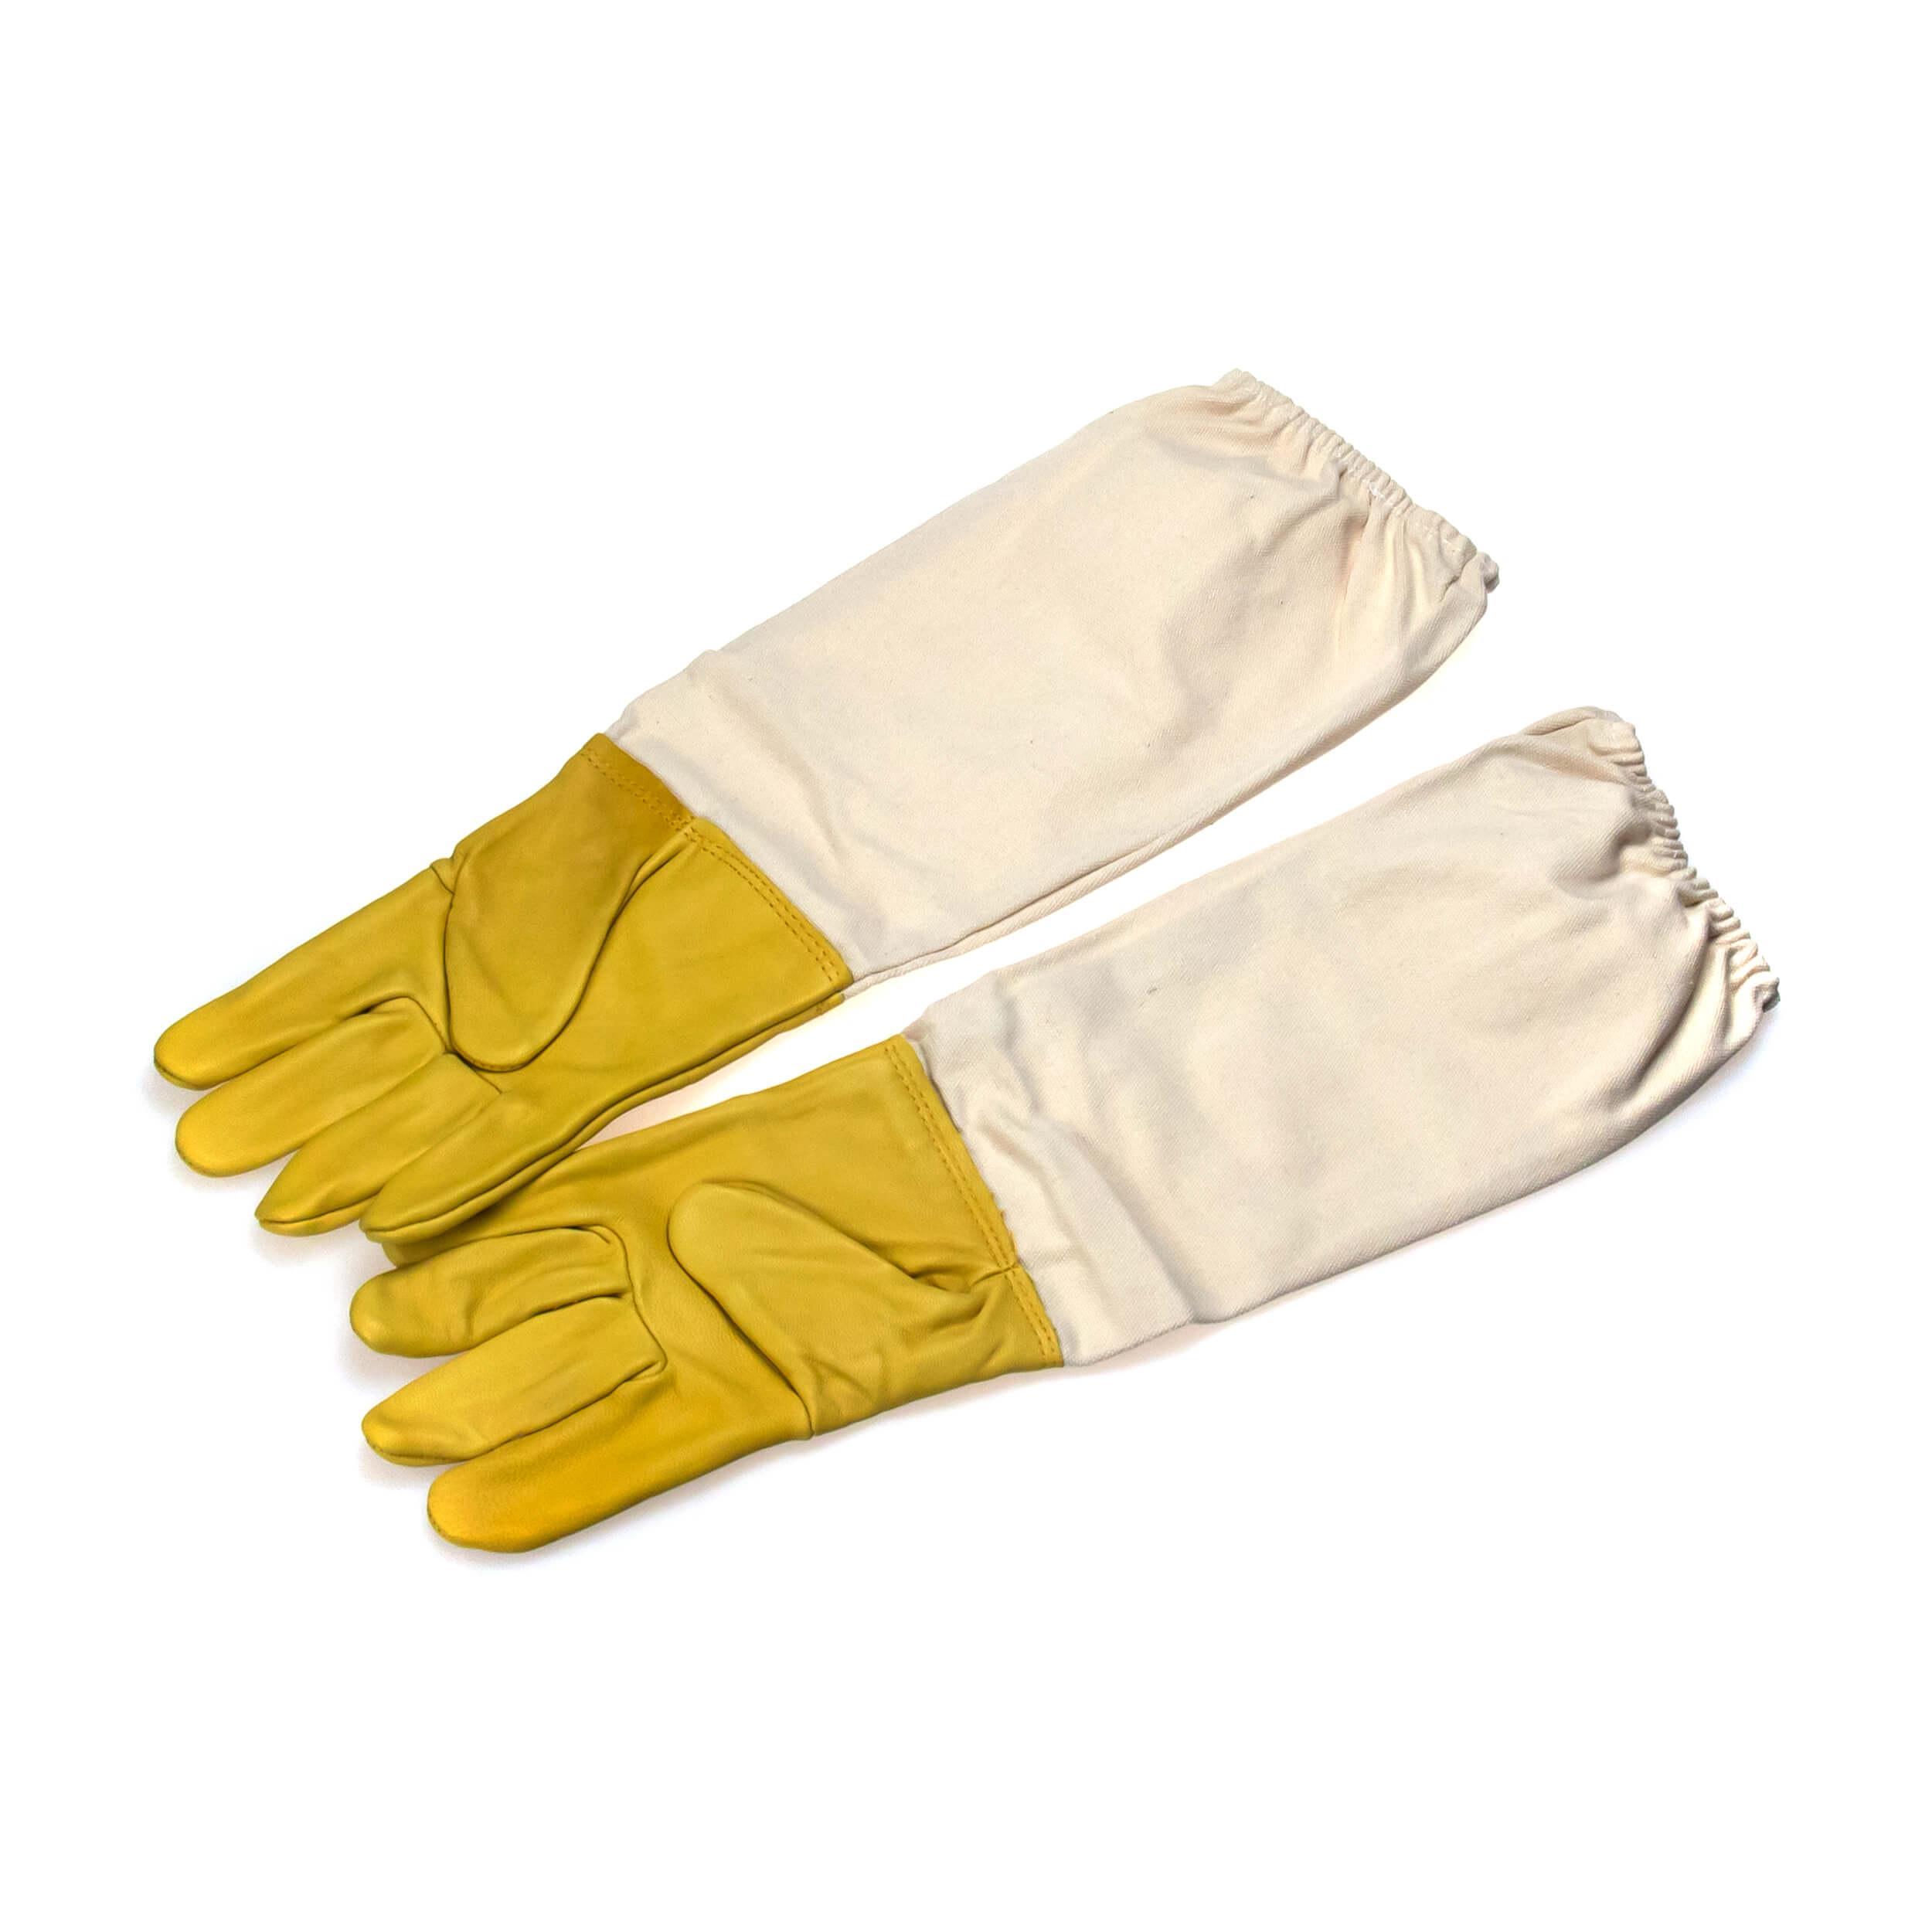 "Перчатки пчеловода ""Api Rugged Leather"" (XXL - 12 размер) фото"